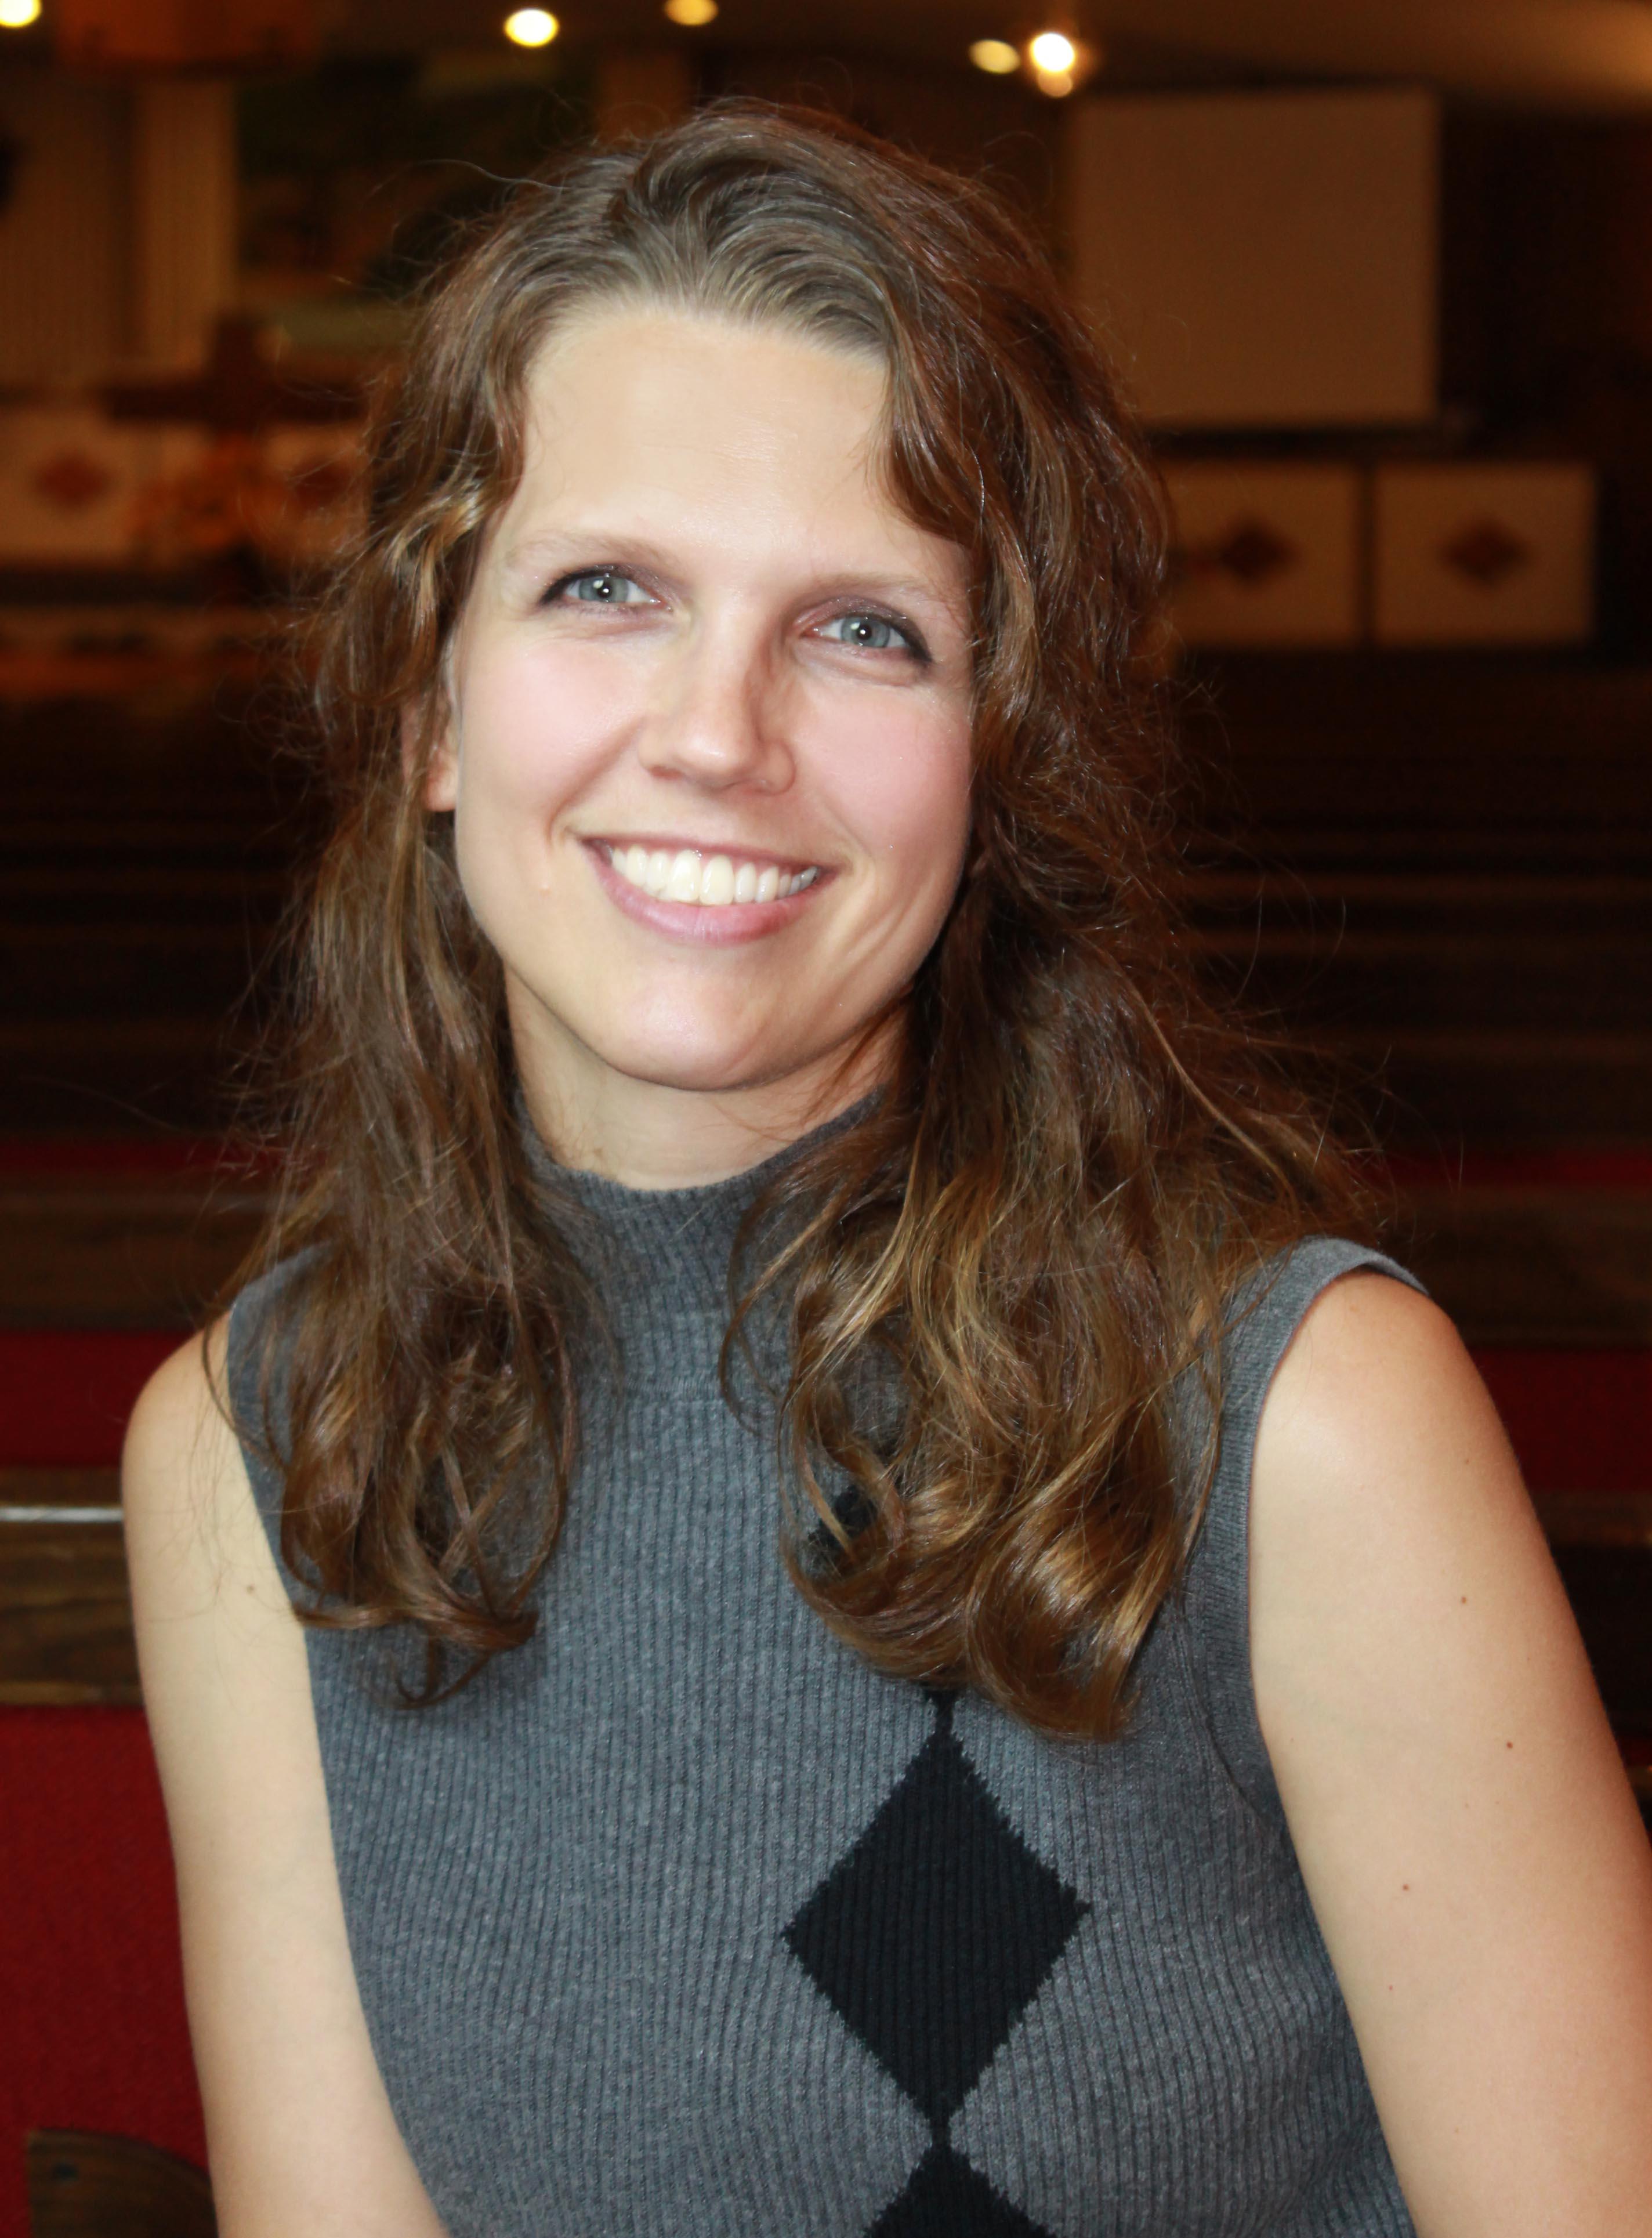 chari crawley children s director east baptist church denison tx